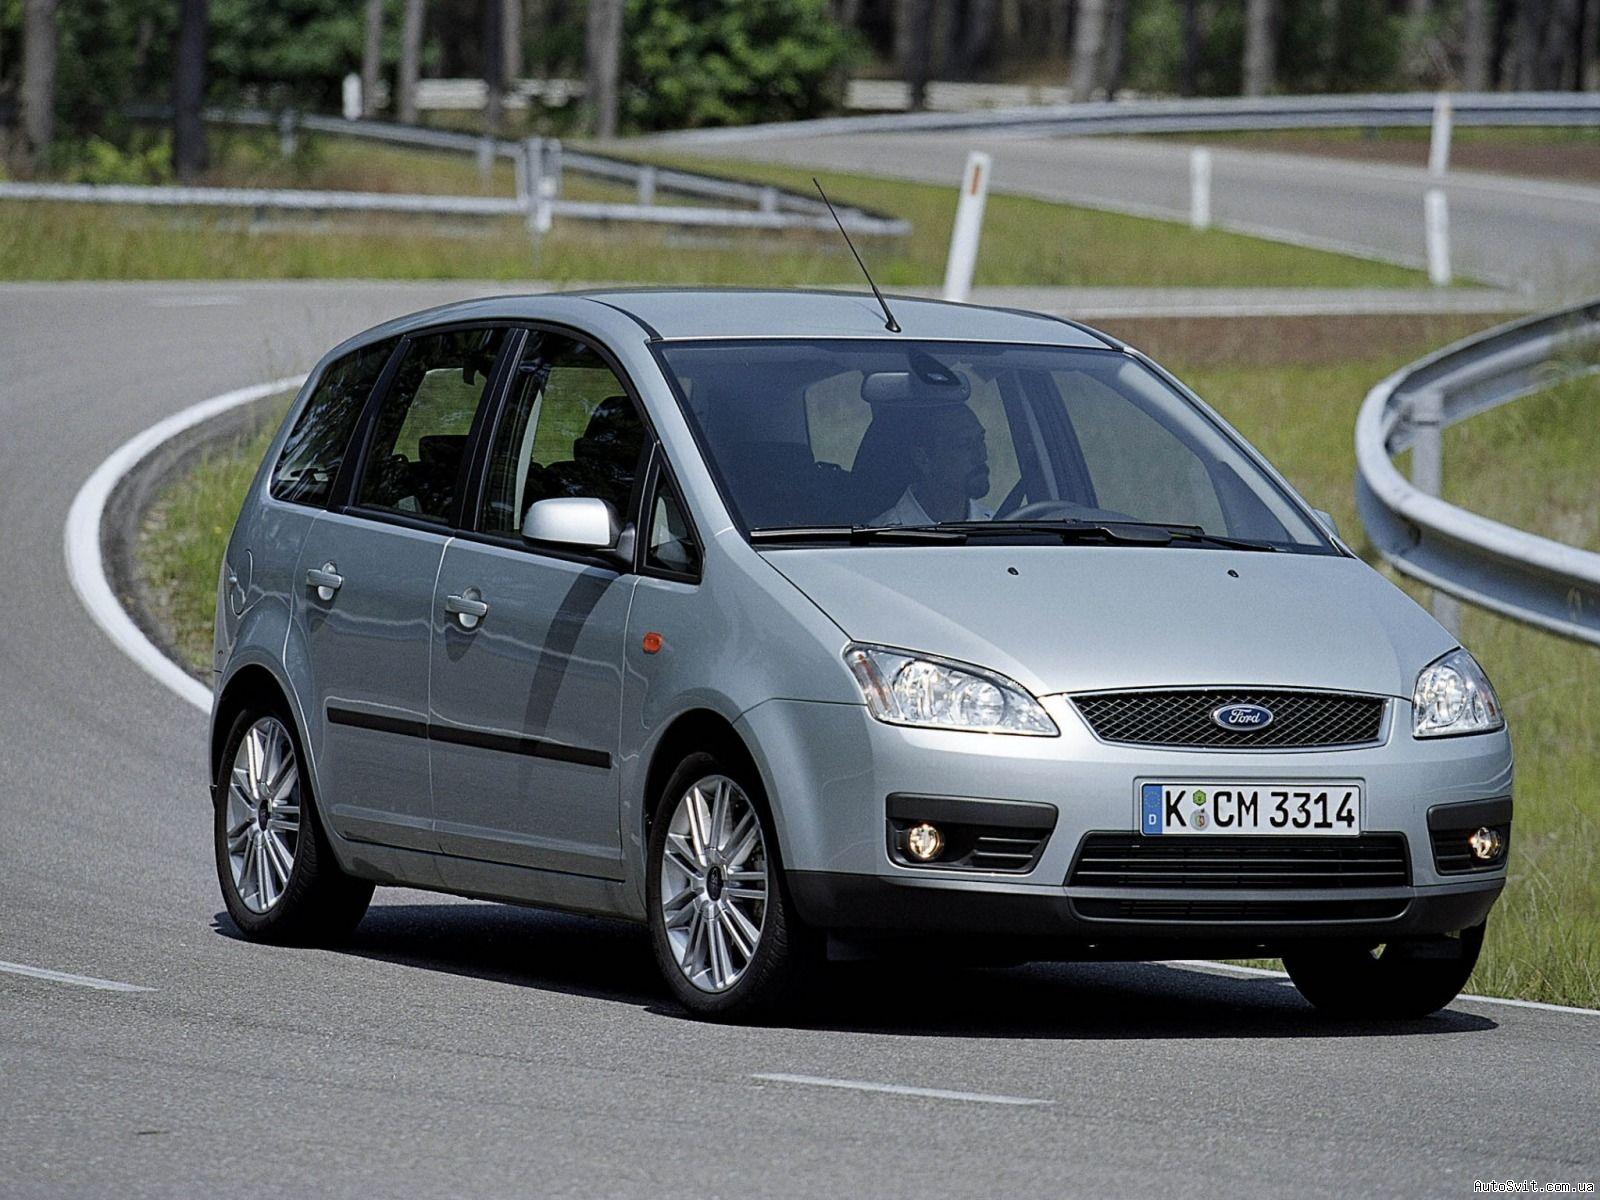 Ford C-max 2005 foto - 3